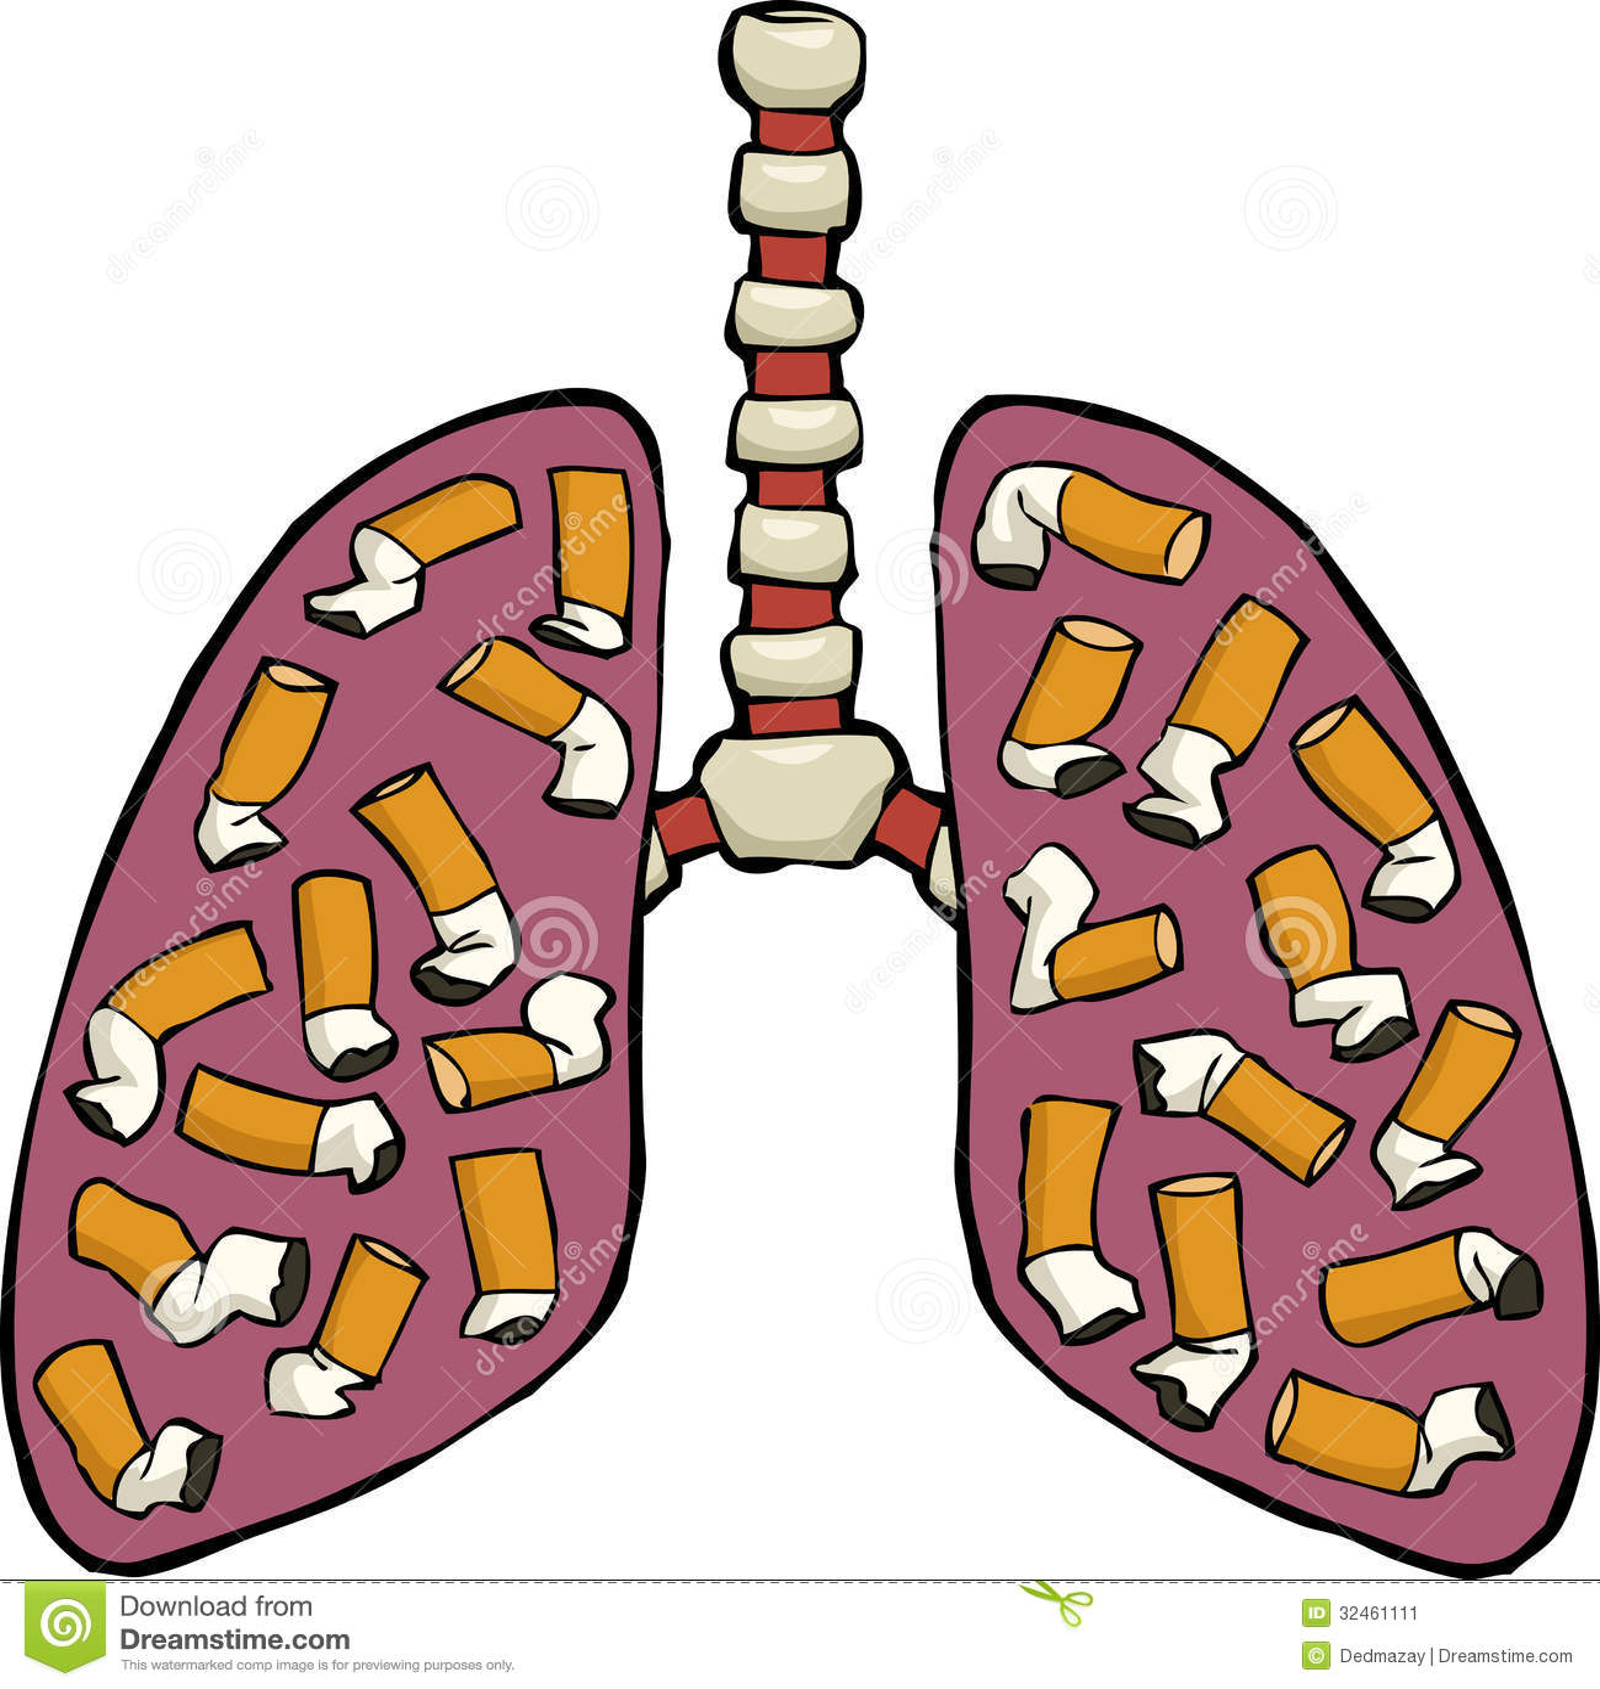 Human Lung Ashtray Stock Image - Image: 32461111